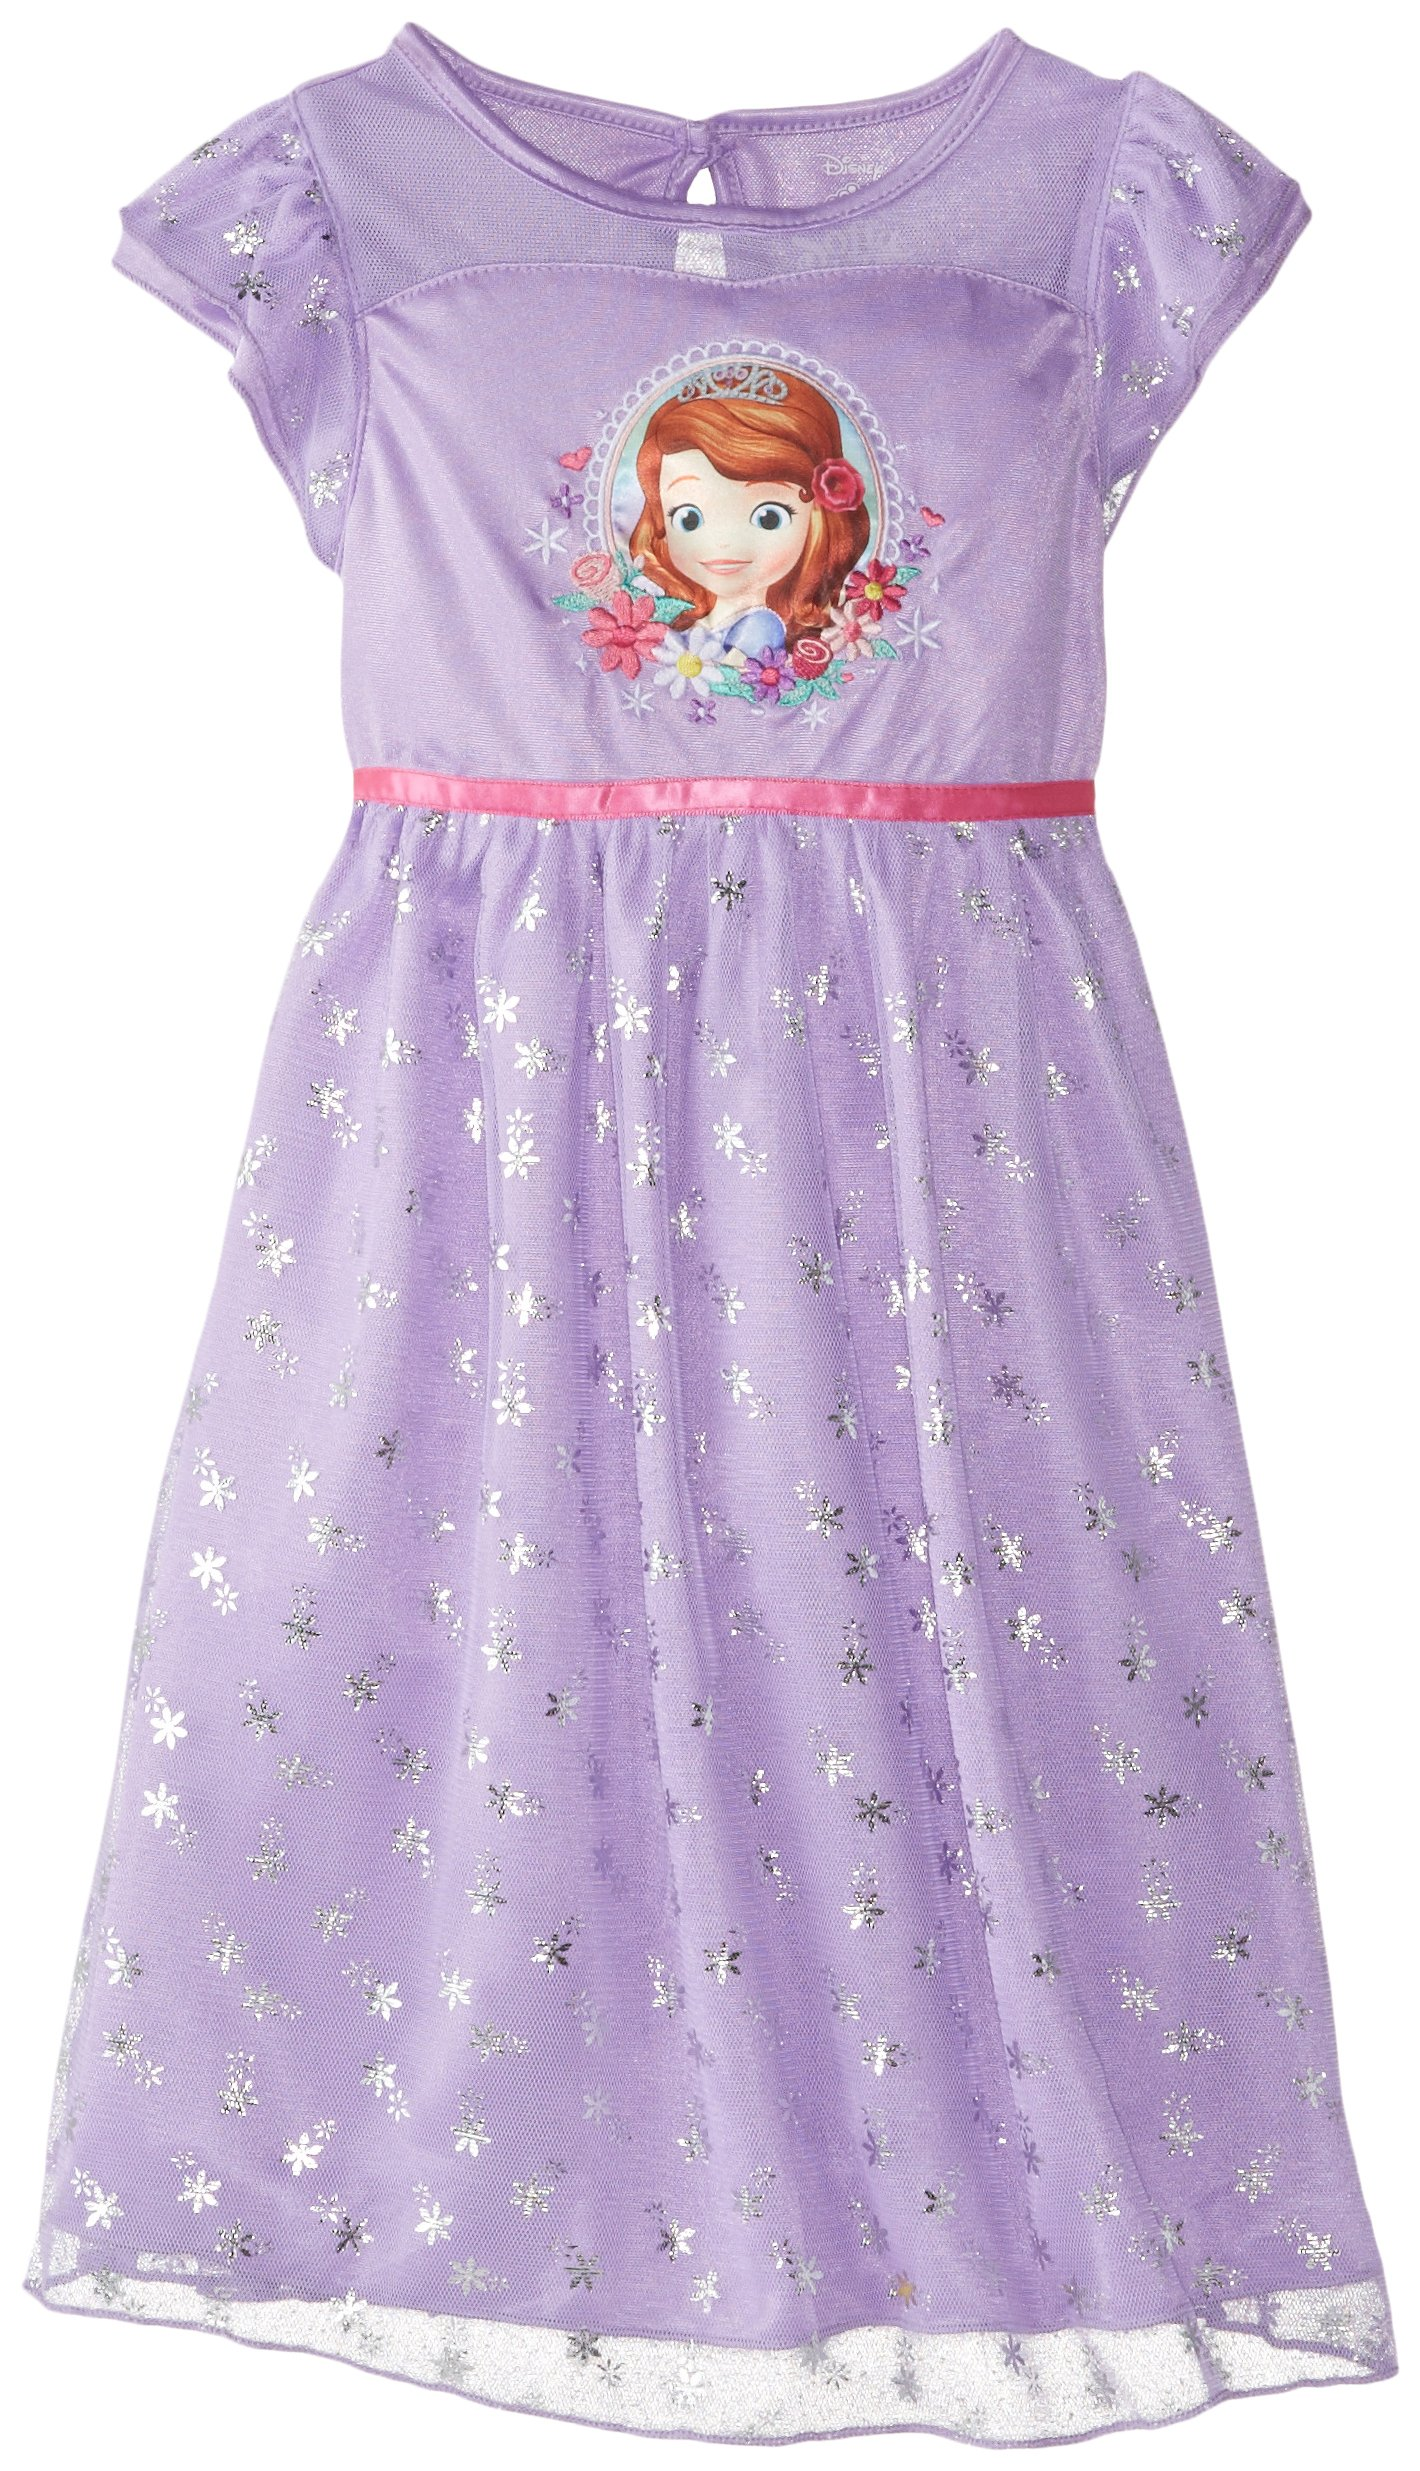 EPC Disney Youth Girls Moana Nightgown